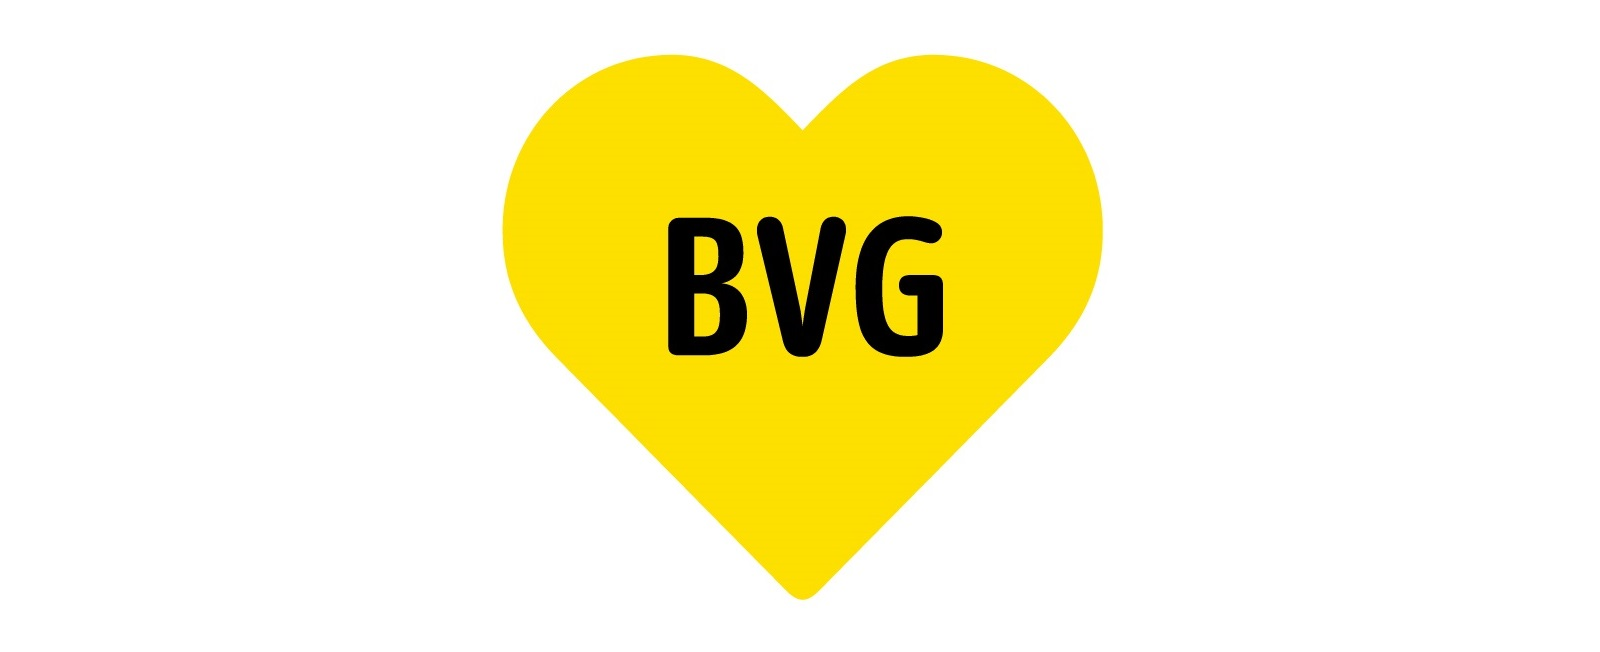 Berliner Verkehrsbetriebe - BVG